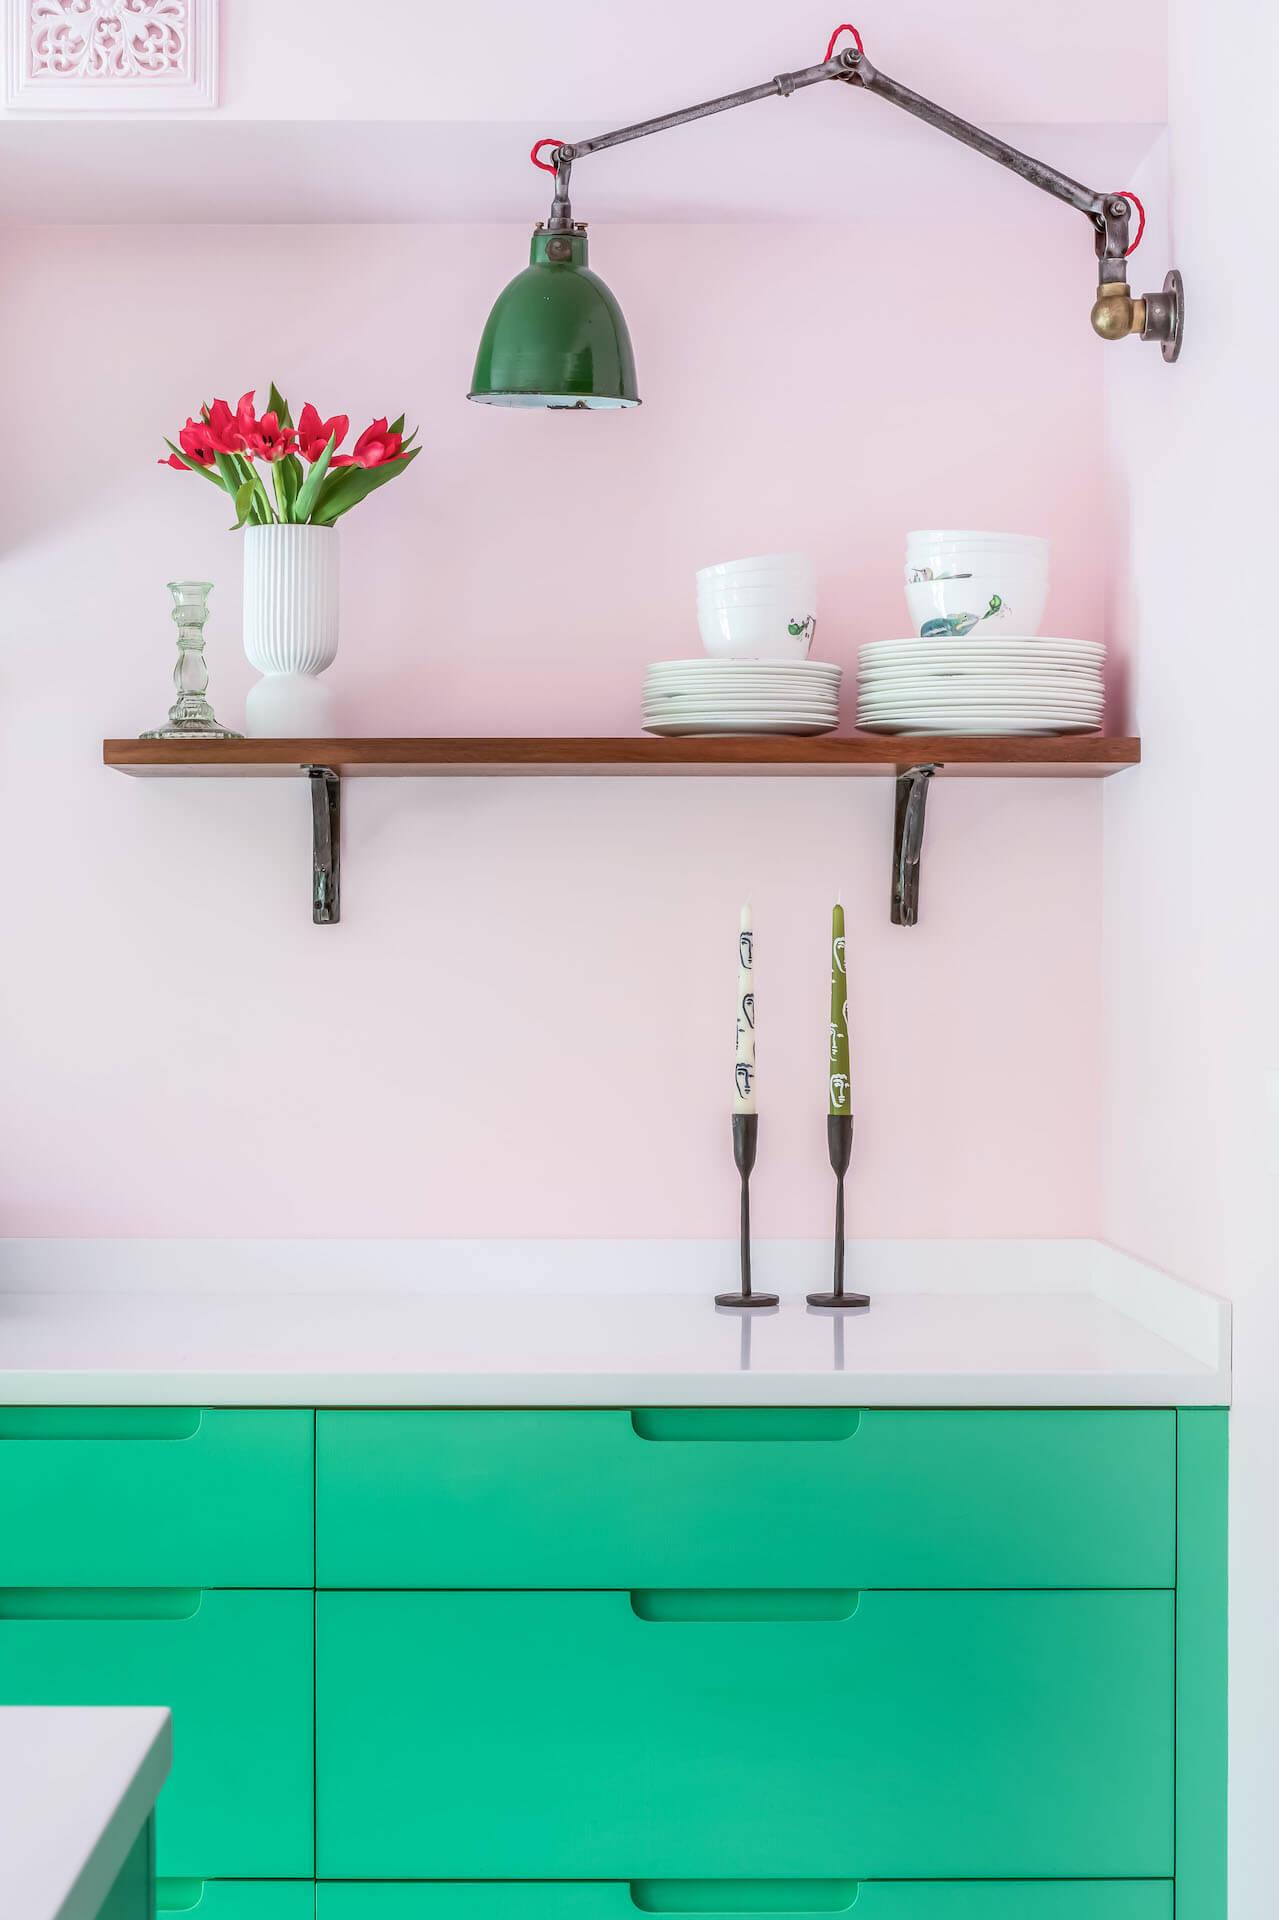 Granada Green Kitchen - Pink walls, Corian Worktop, Retrovious Lights